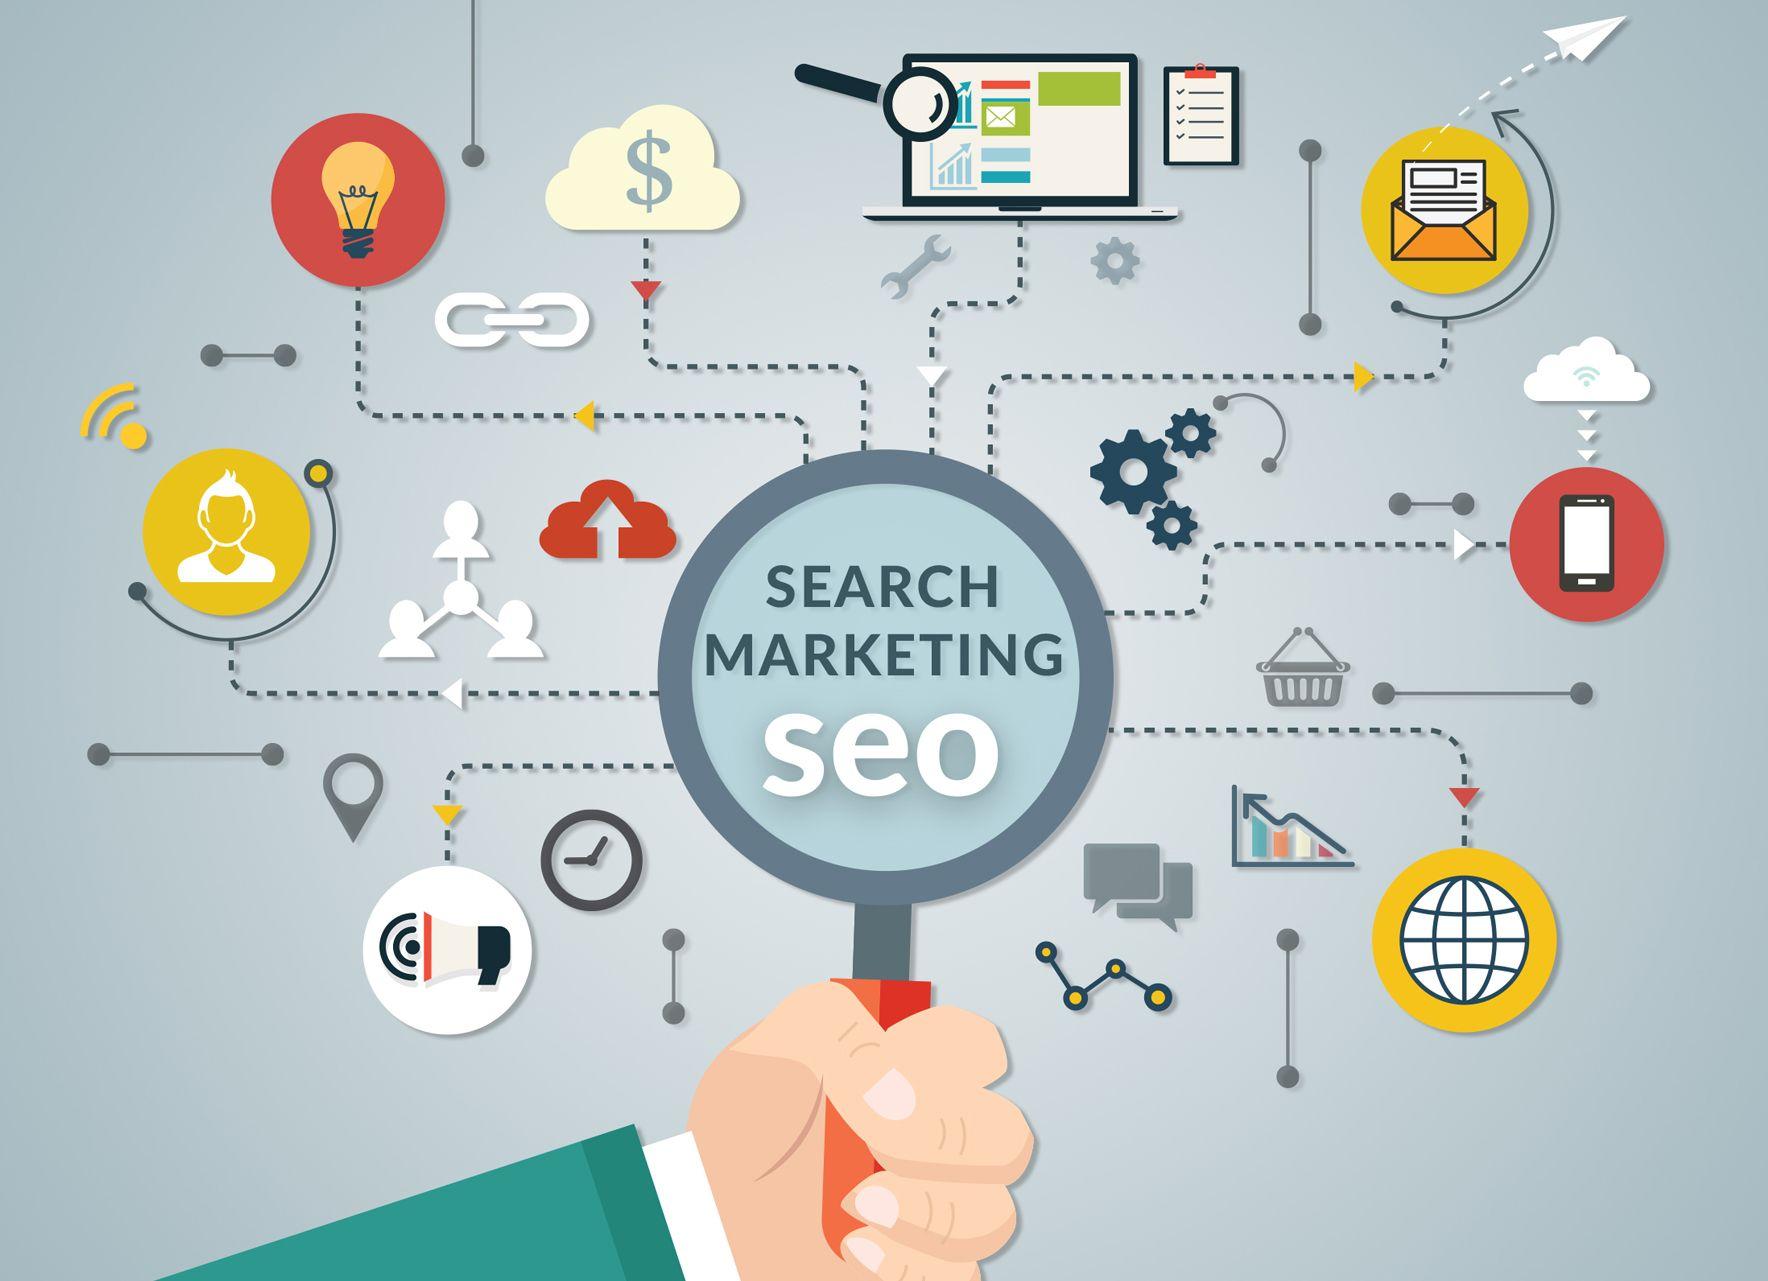 Search Marketing SEO / PPC